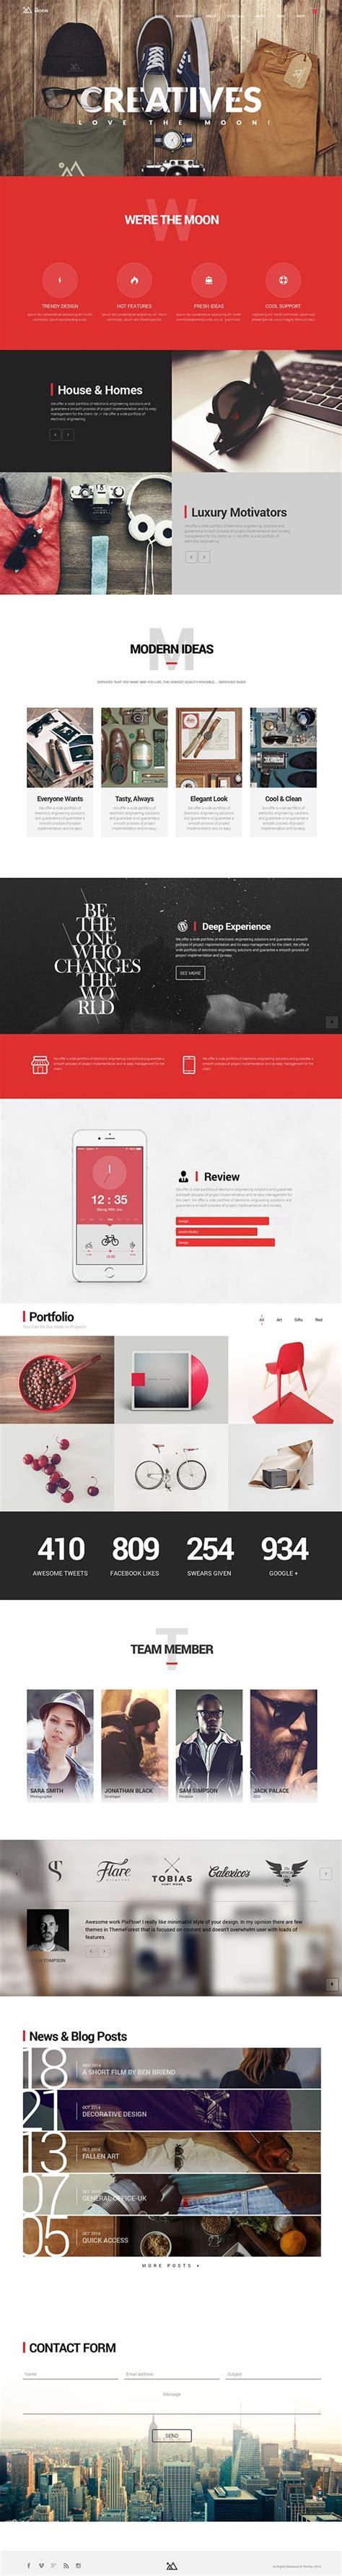 good website ideas 15 great website layout ideas for inspiration